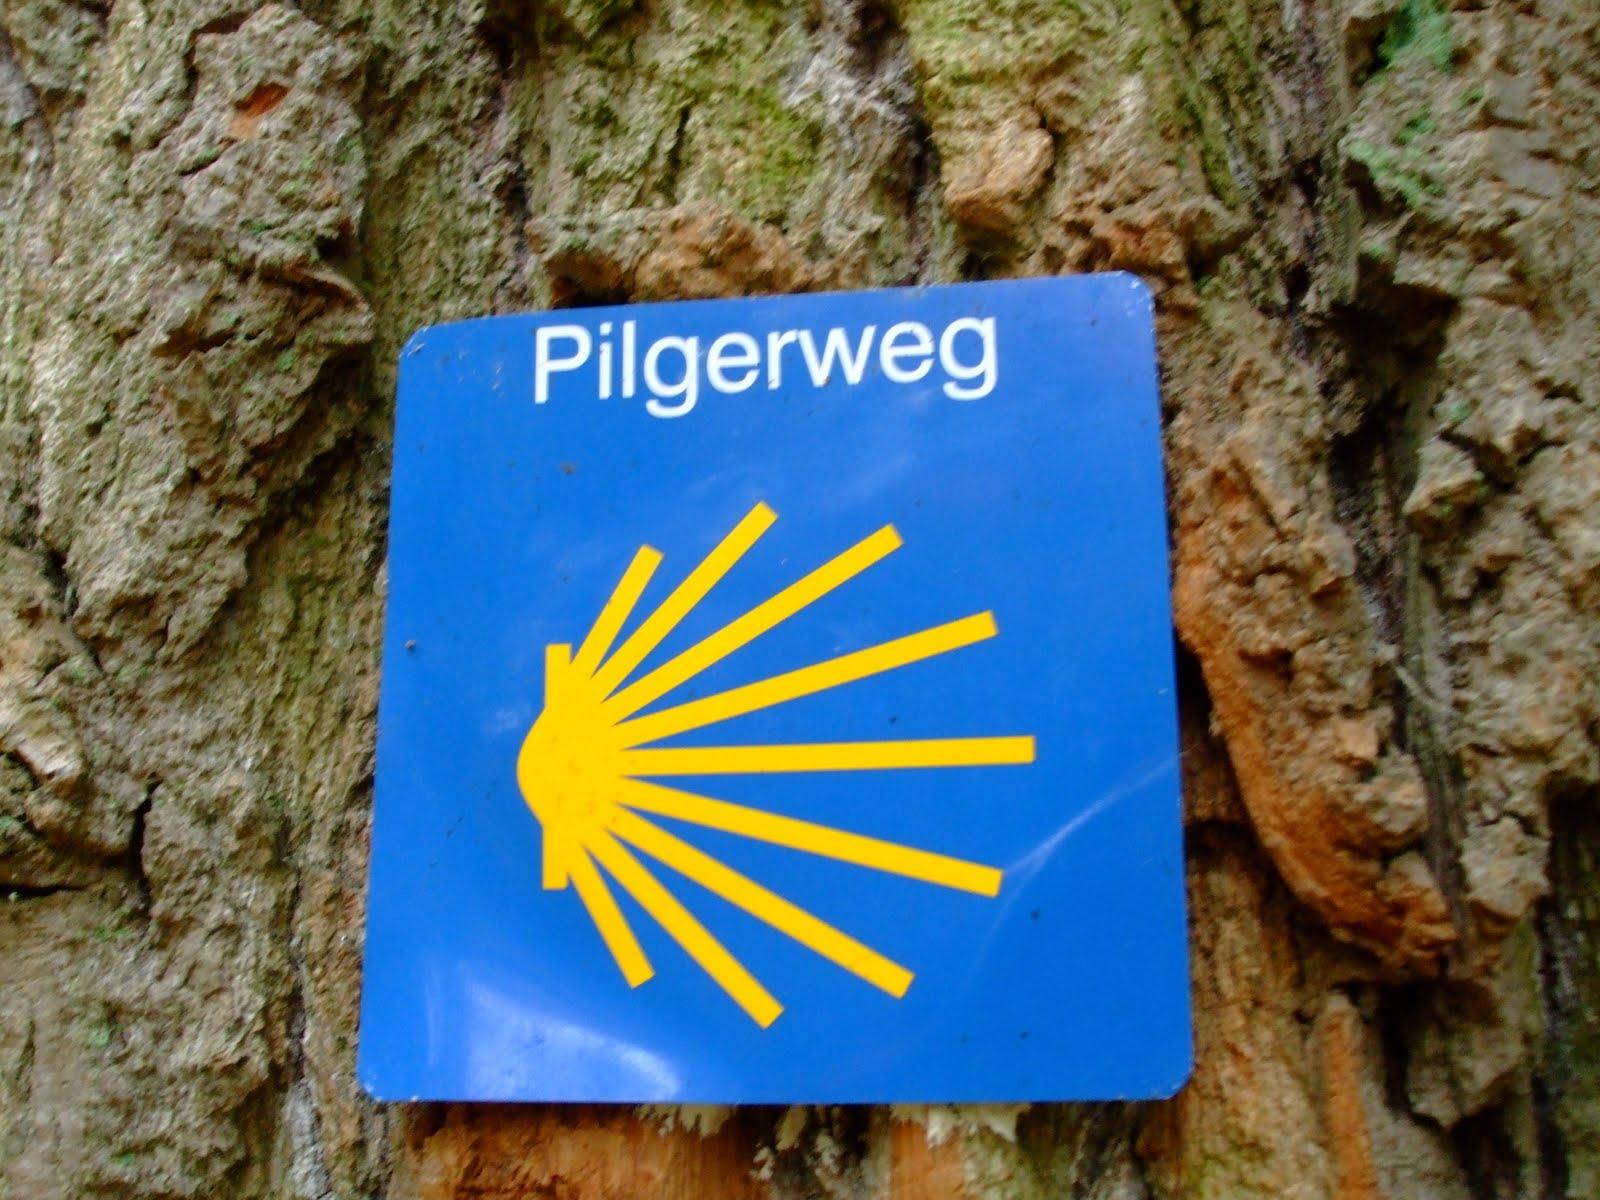 jakobsweg camino de santiago 29 oktober 2011 jakobsweg deutschland 2 etappe duisburg. Black Bedroom Furniture Sets. Home Design Ideas